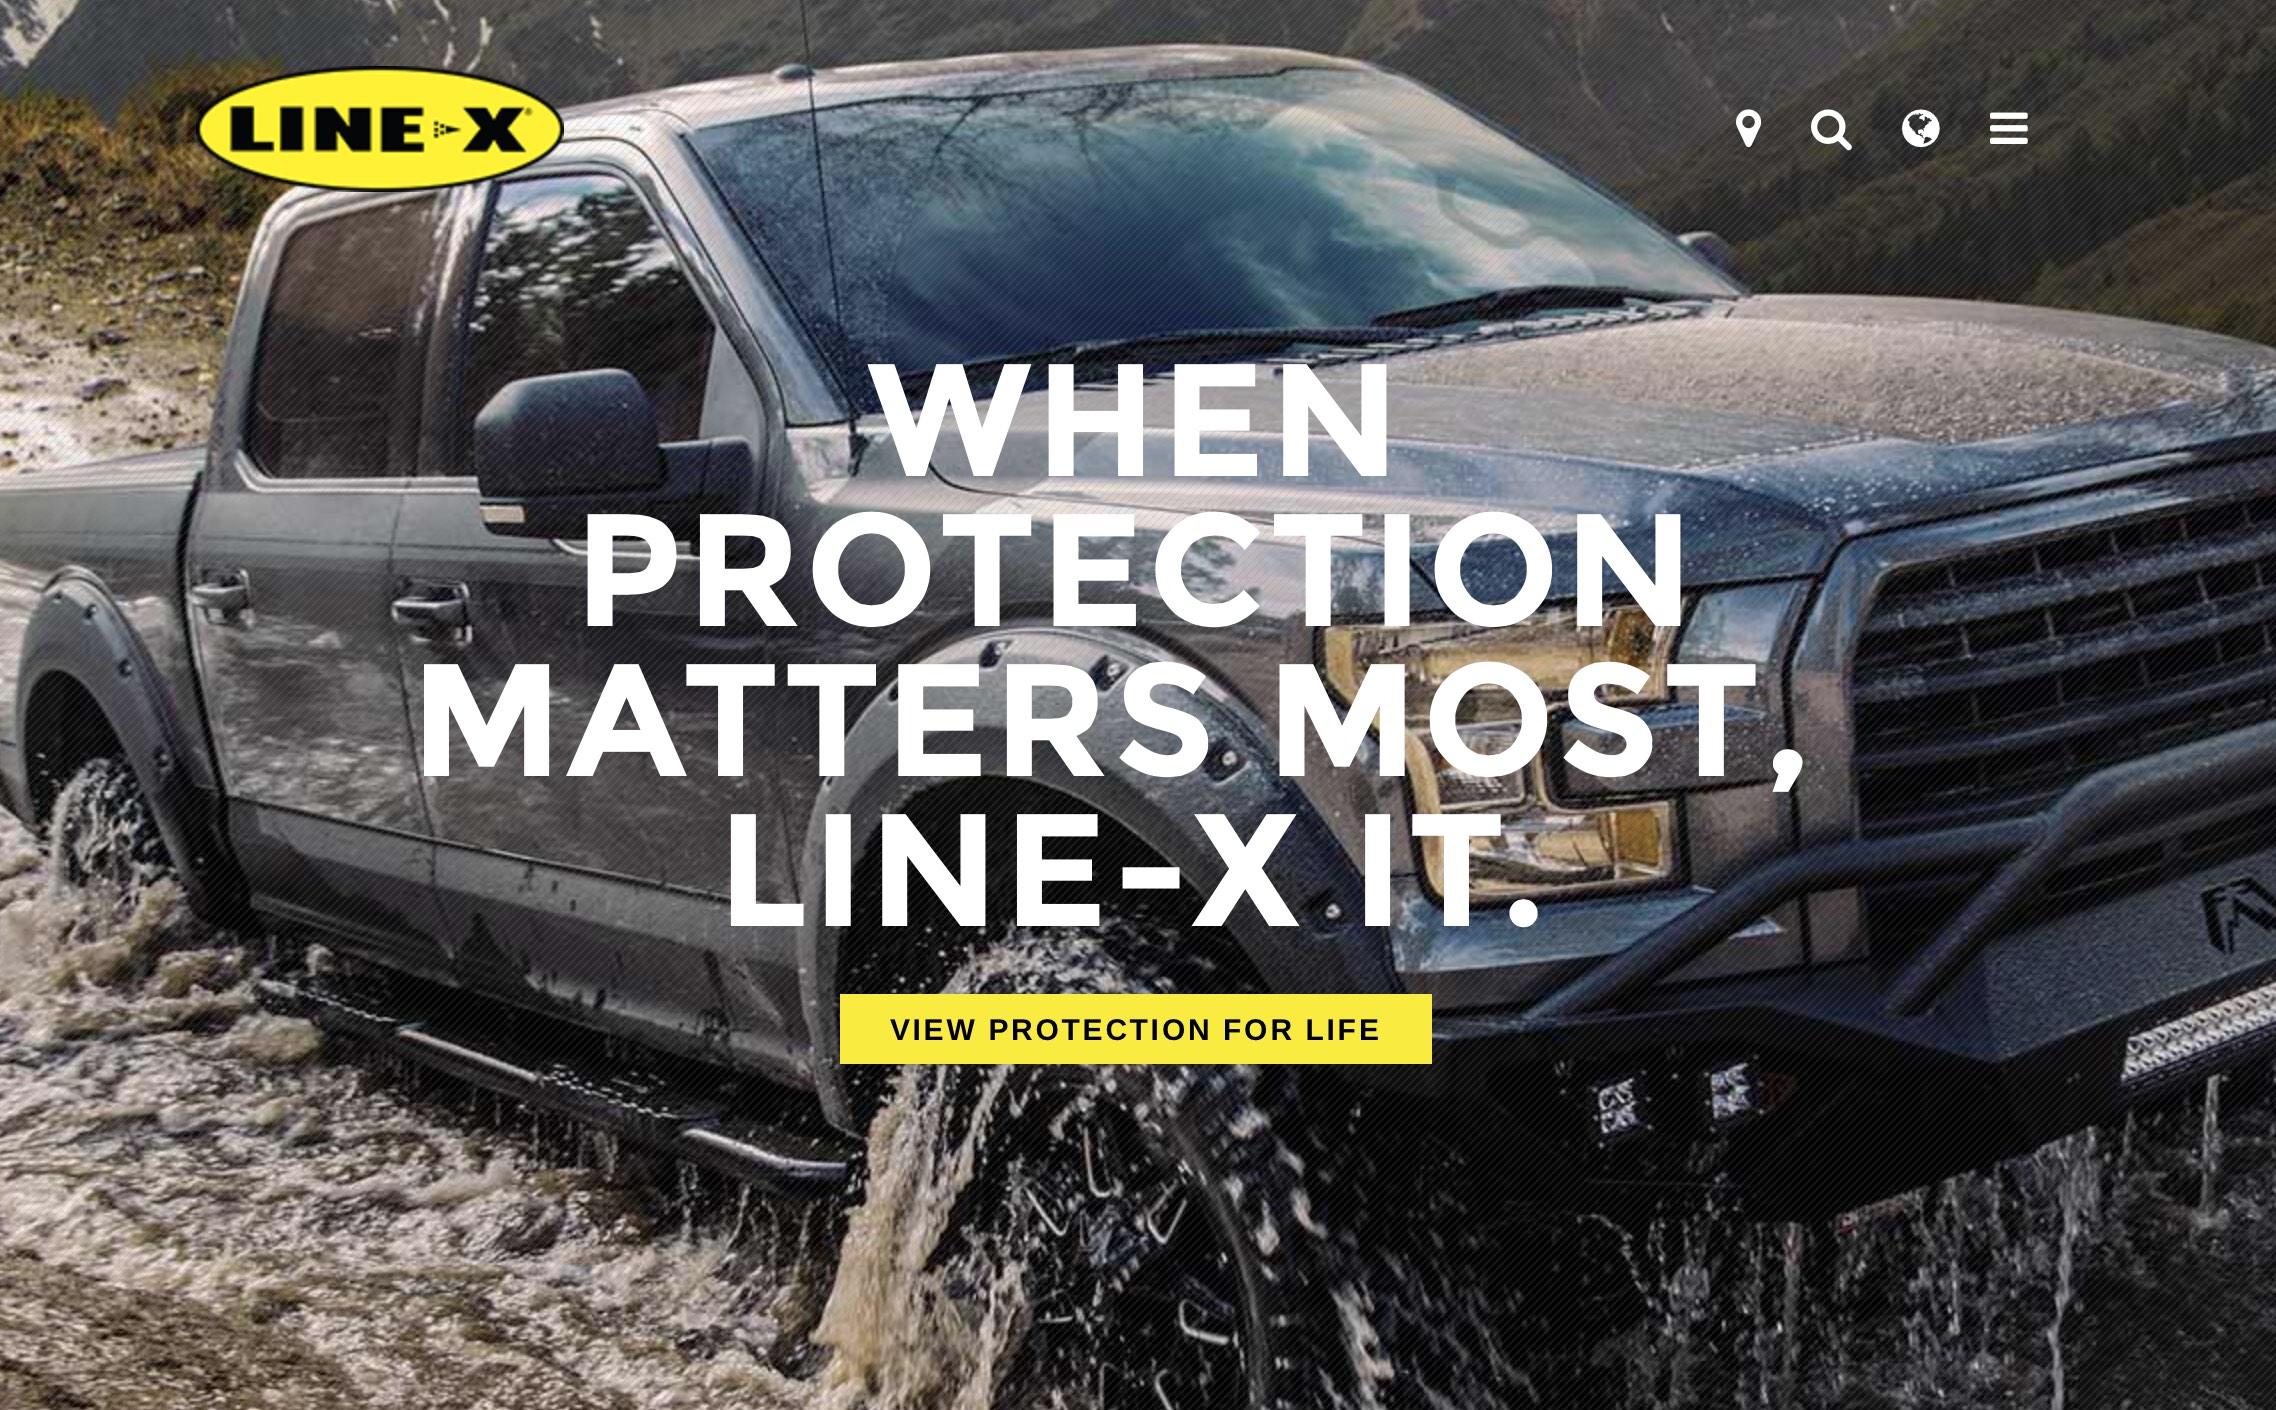 LINE-X®